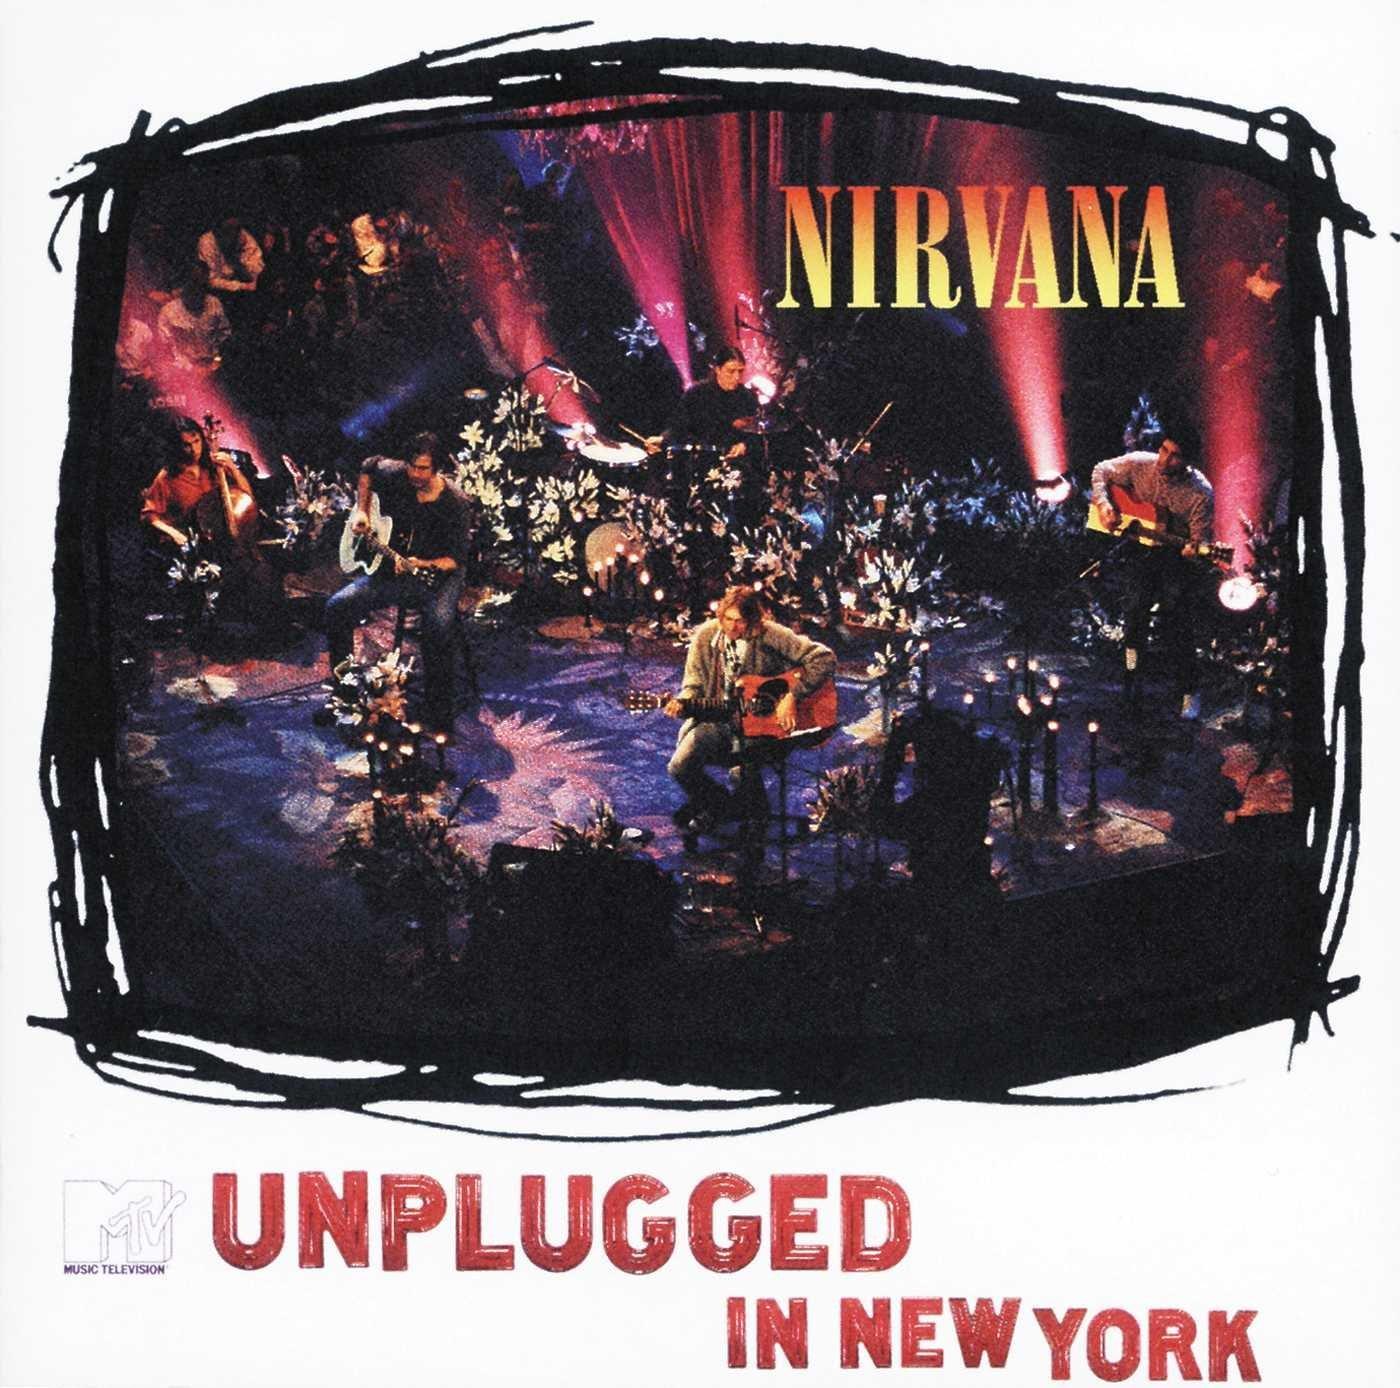 Nirvana MTV Unplugged in New York [VINYL] £10 prime / £11.99 non prime Amazon